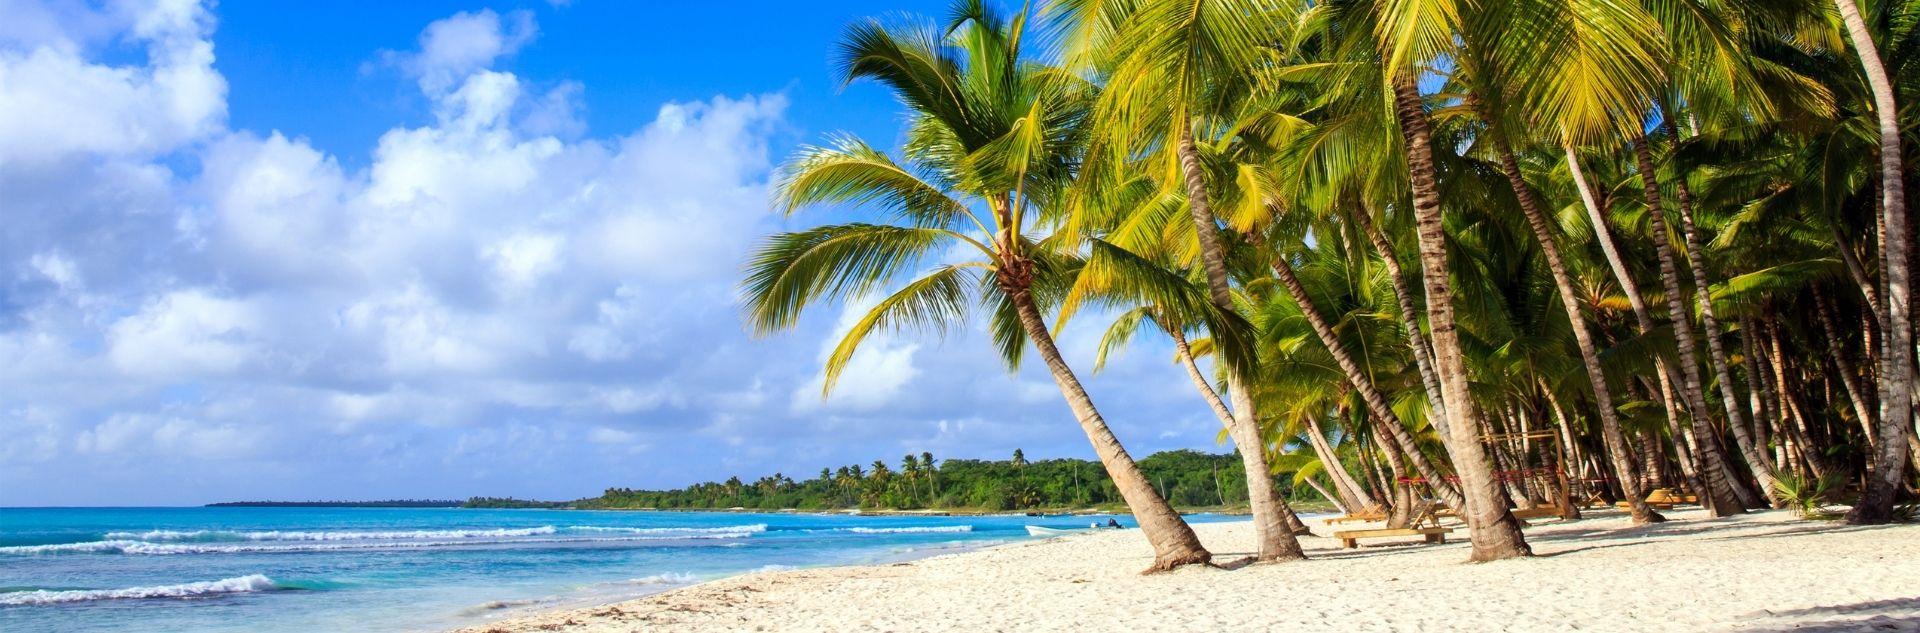 Dominikanische Republik, Strand, Palmen, Meer